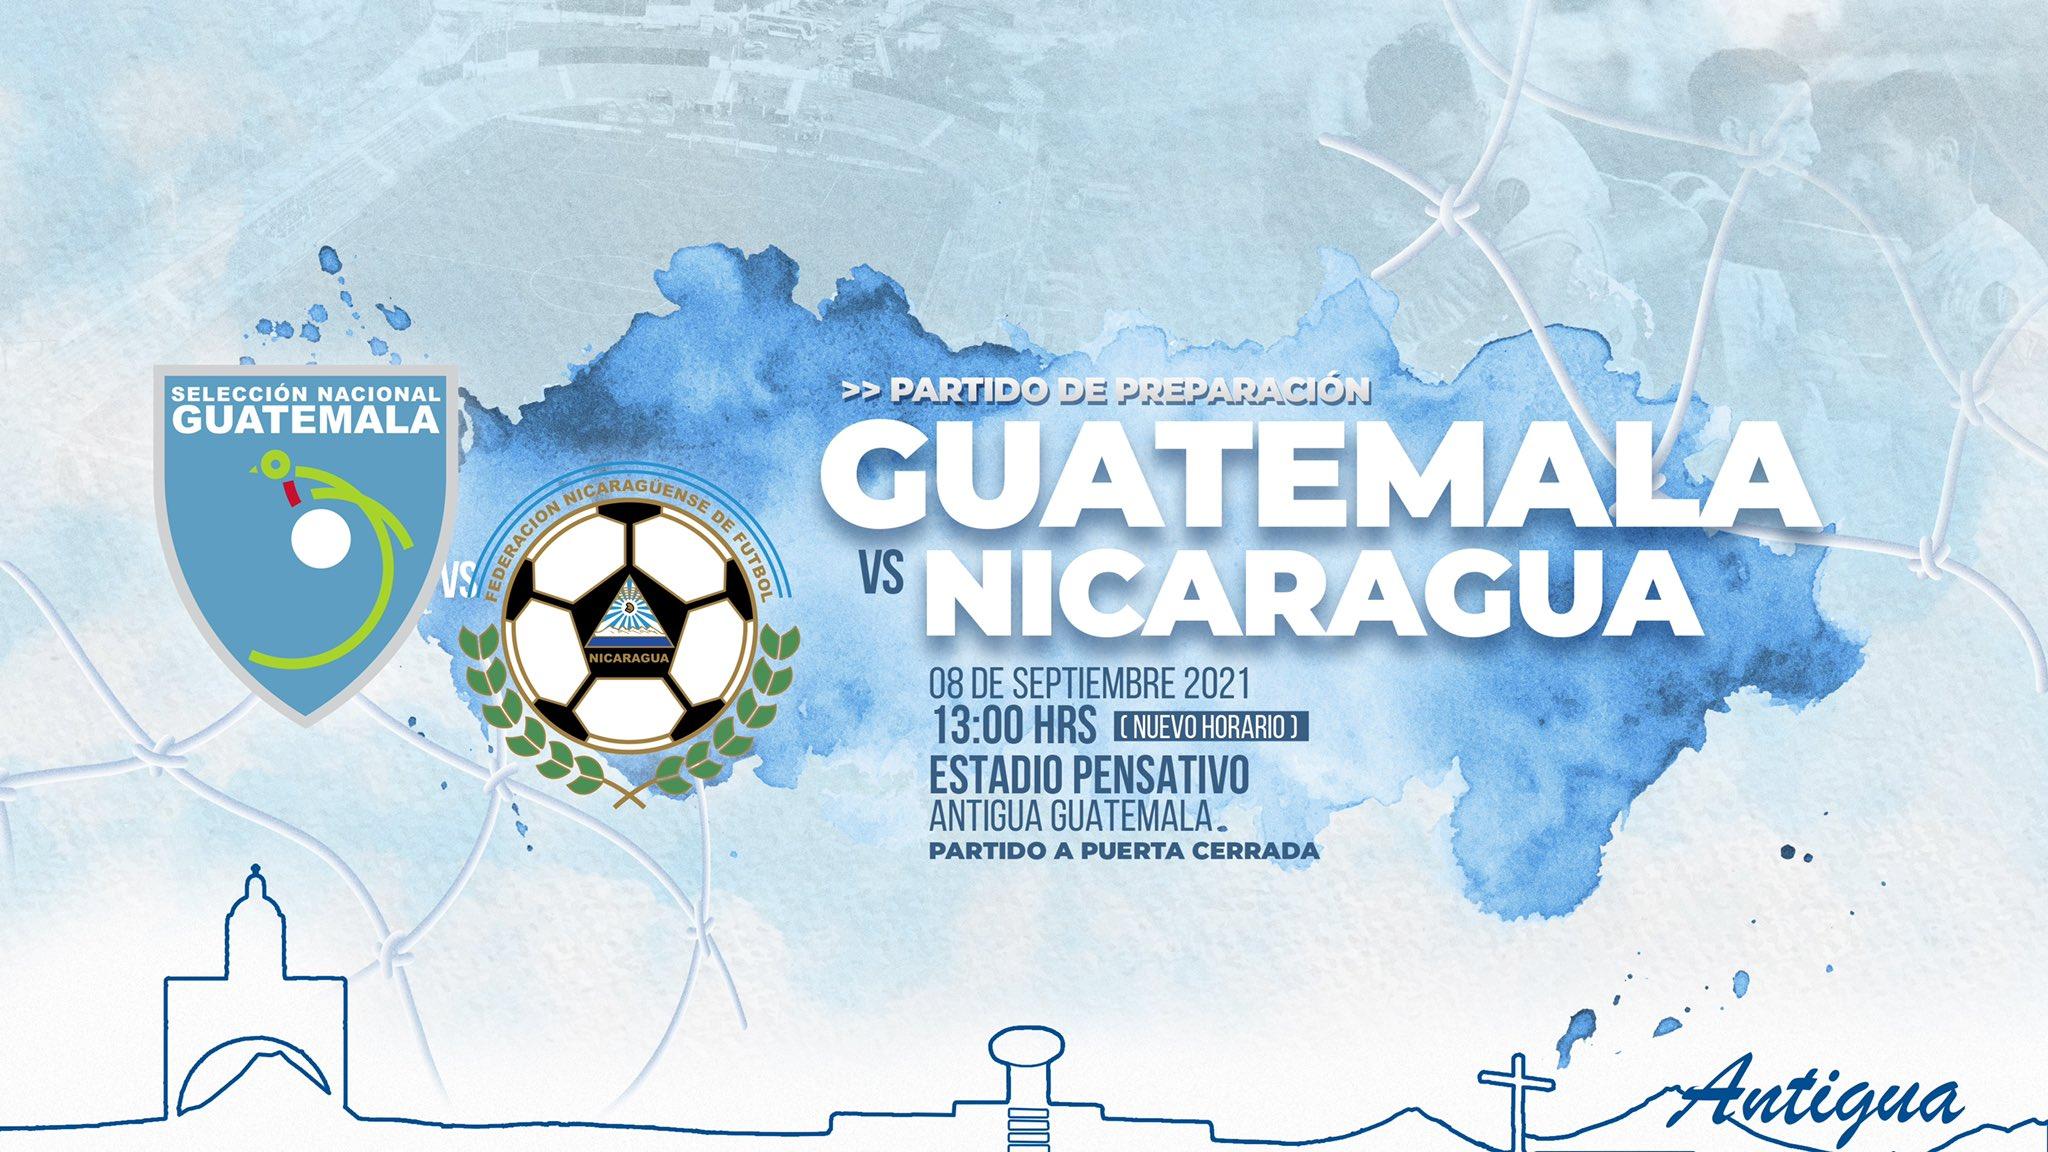 Guatemala vs Nicaragua